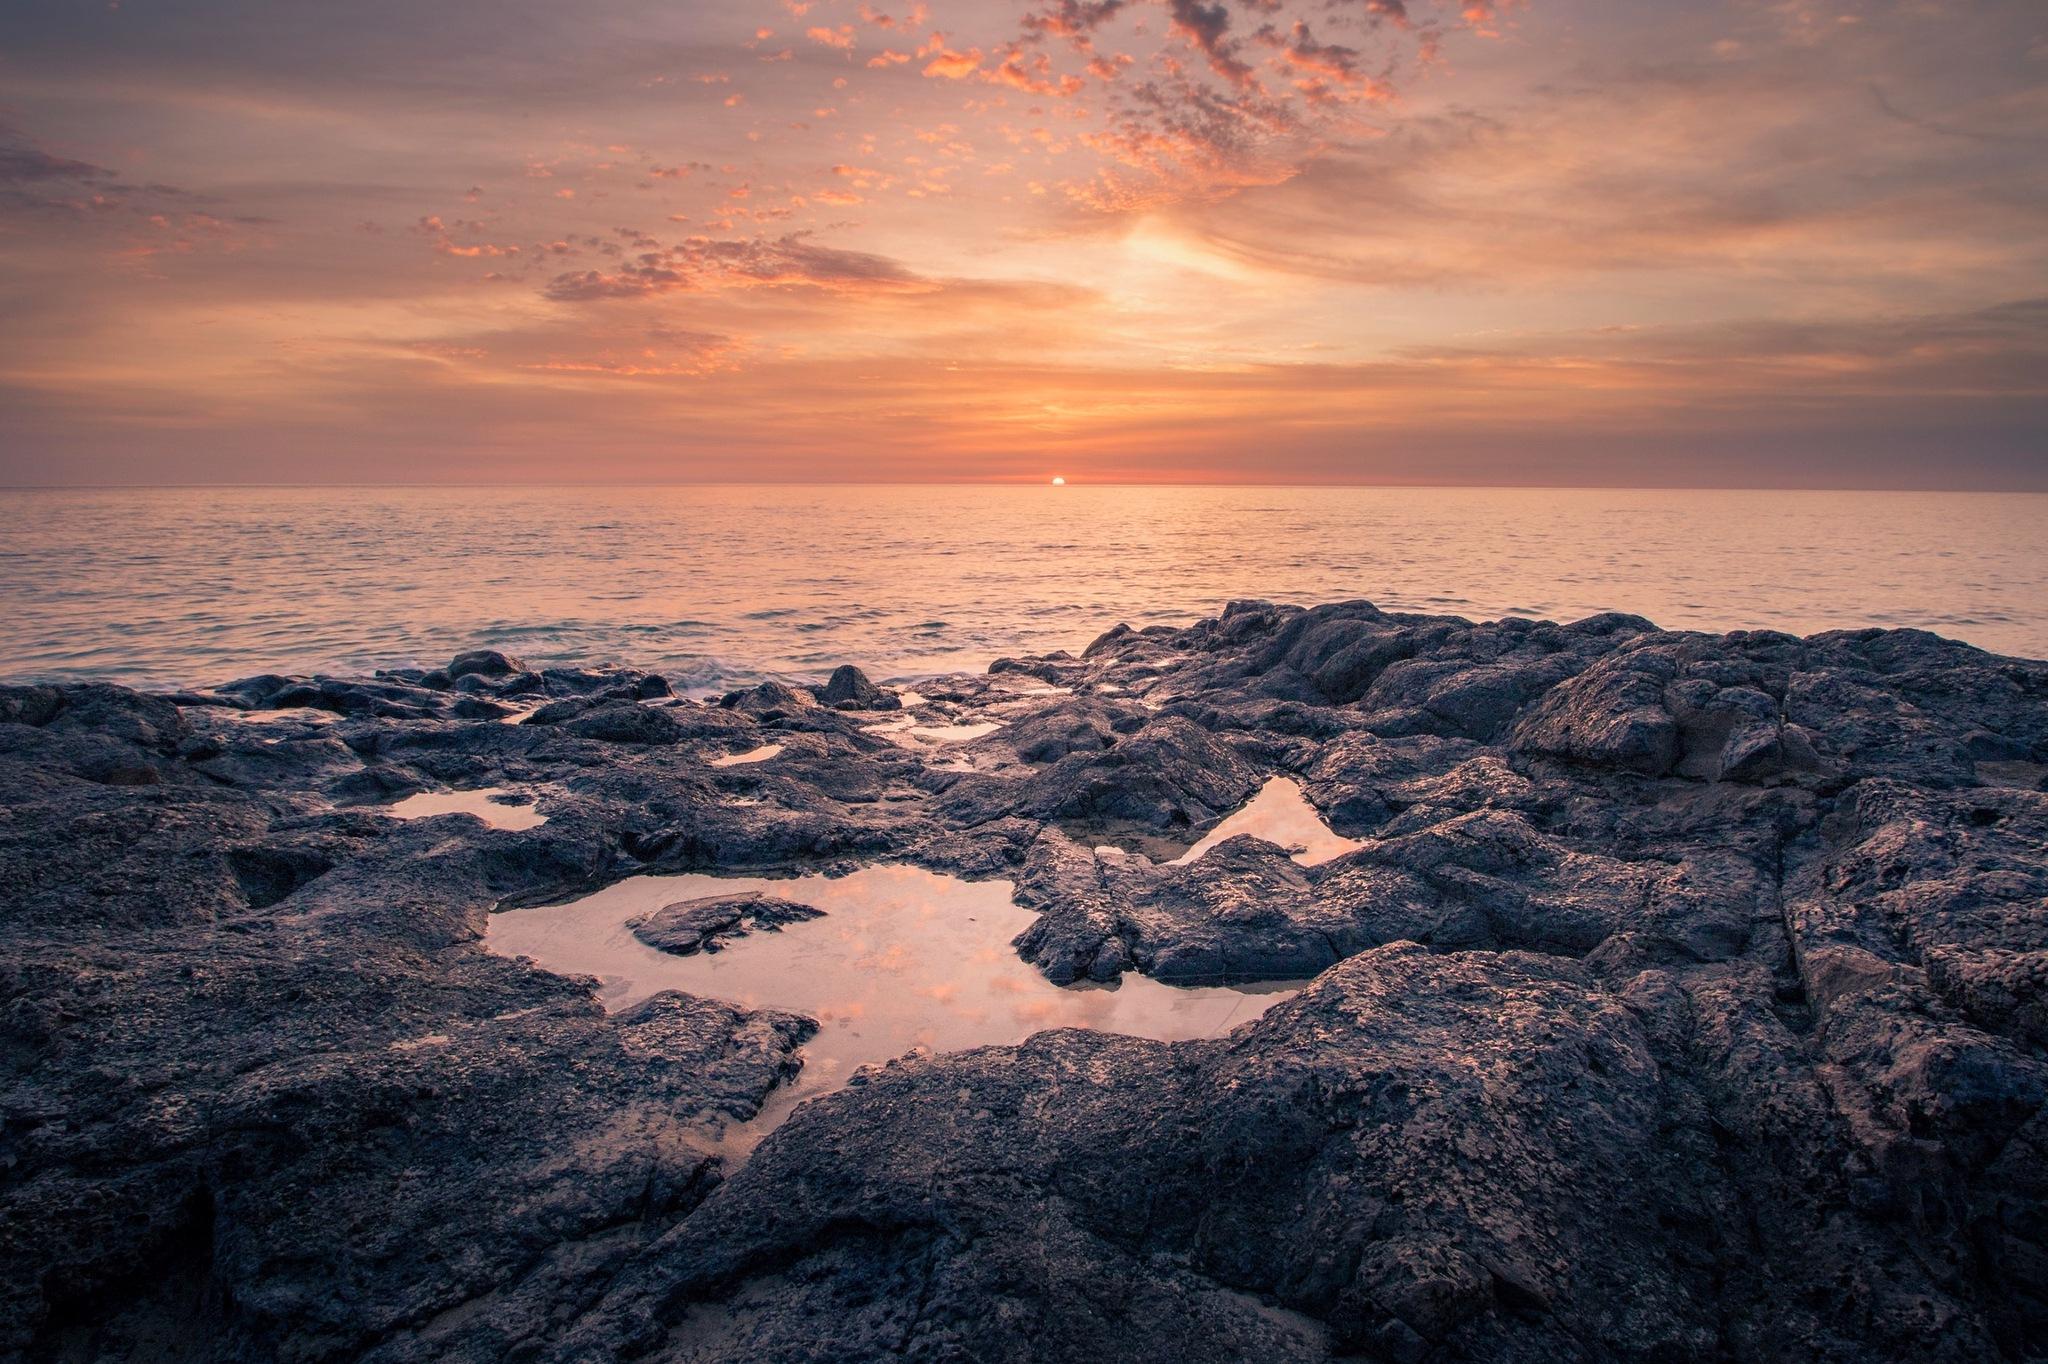 Sunrise on Fuerteventura by Jens Eldøy